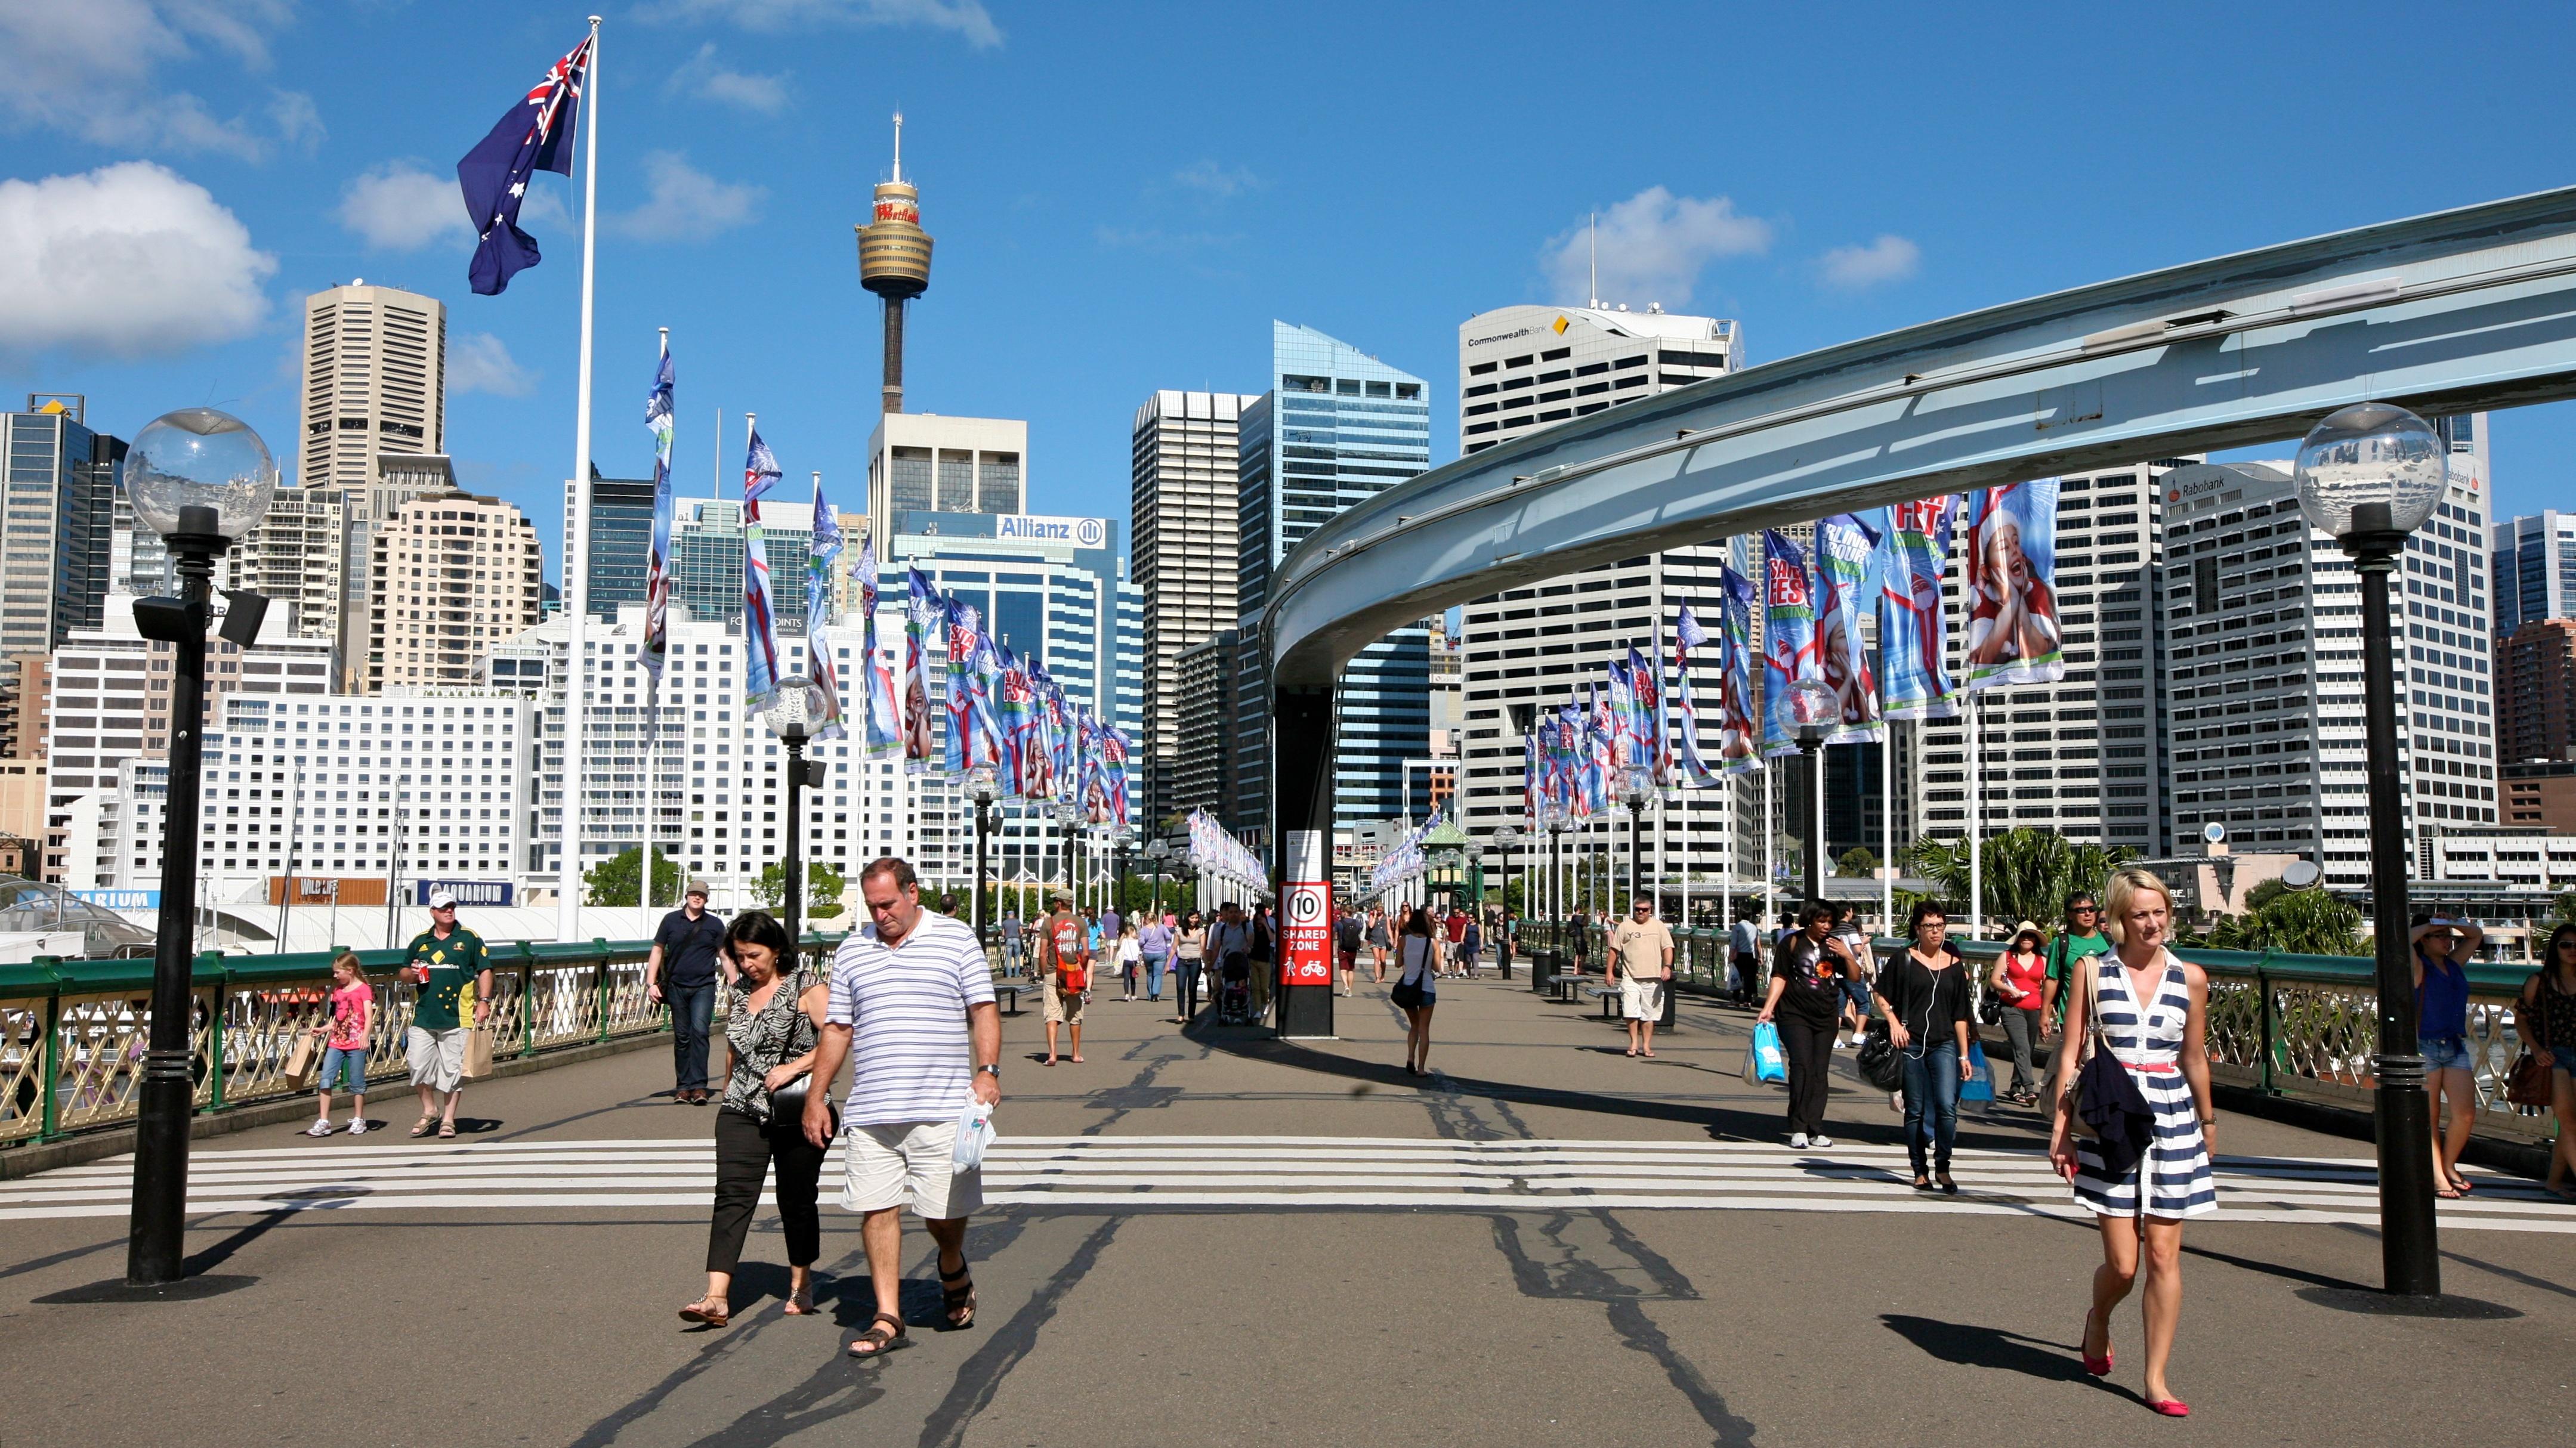 Sofitel Sydney Darling Harbour - UPDATED 2018 Prices